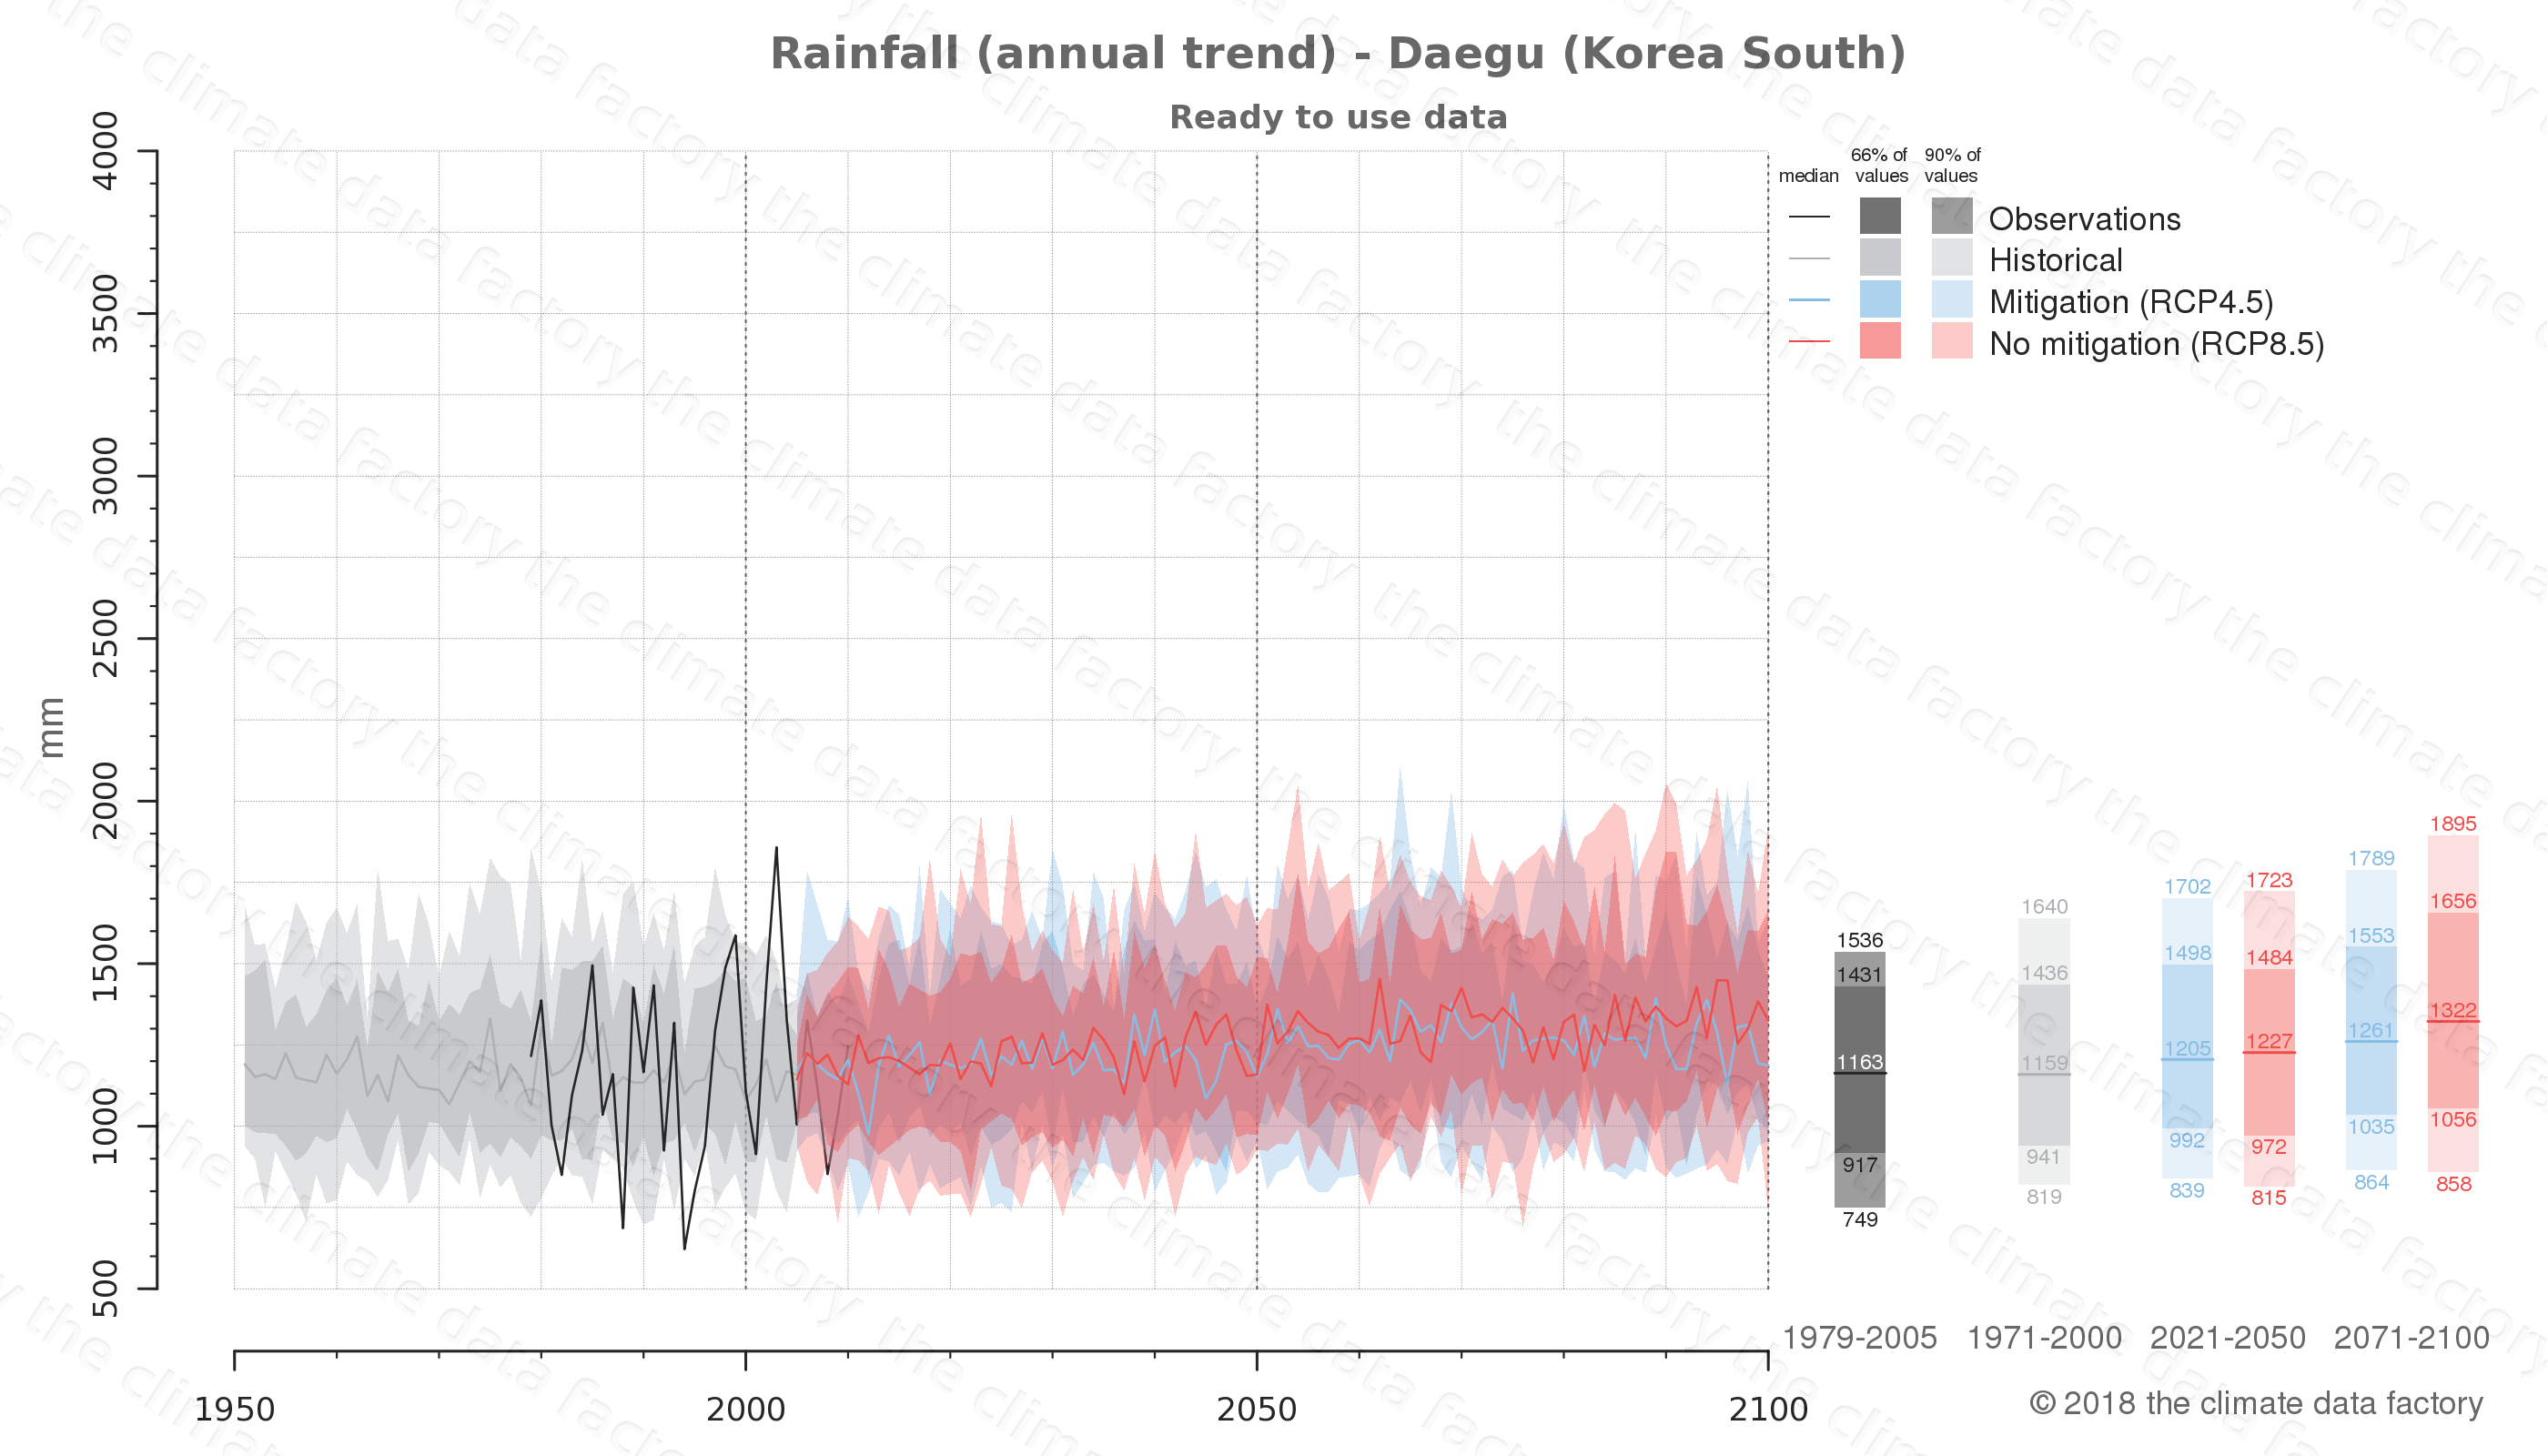 climate change data policy adaptation climate graph city data rainfall daegu south korea